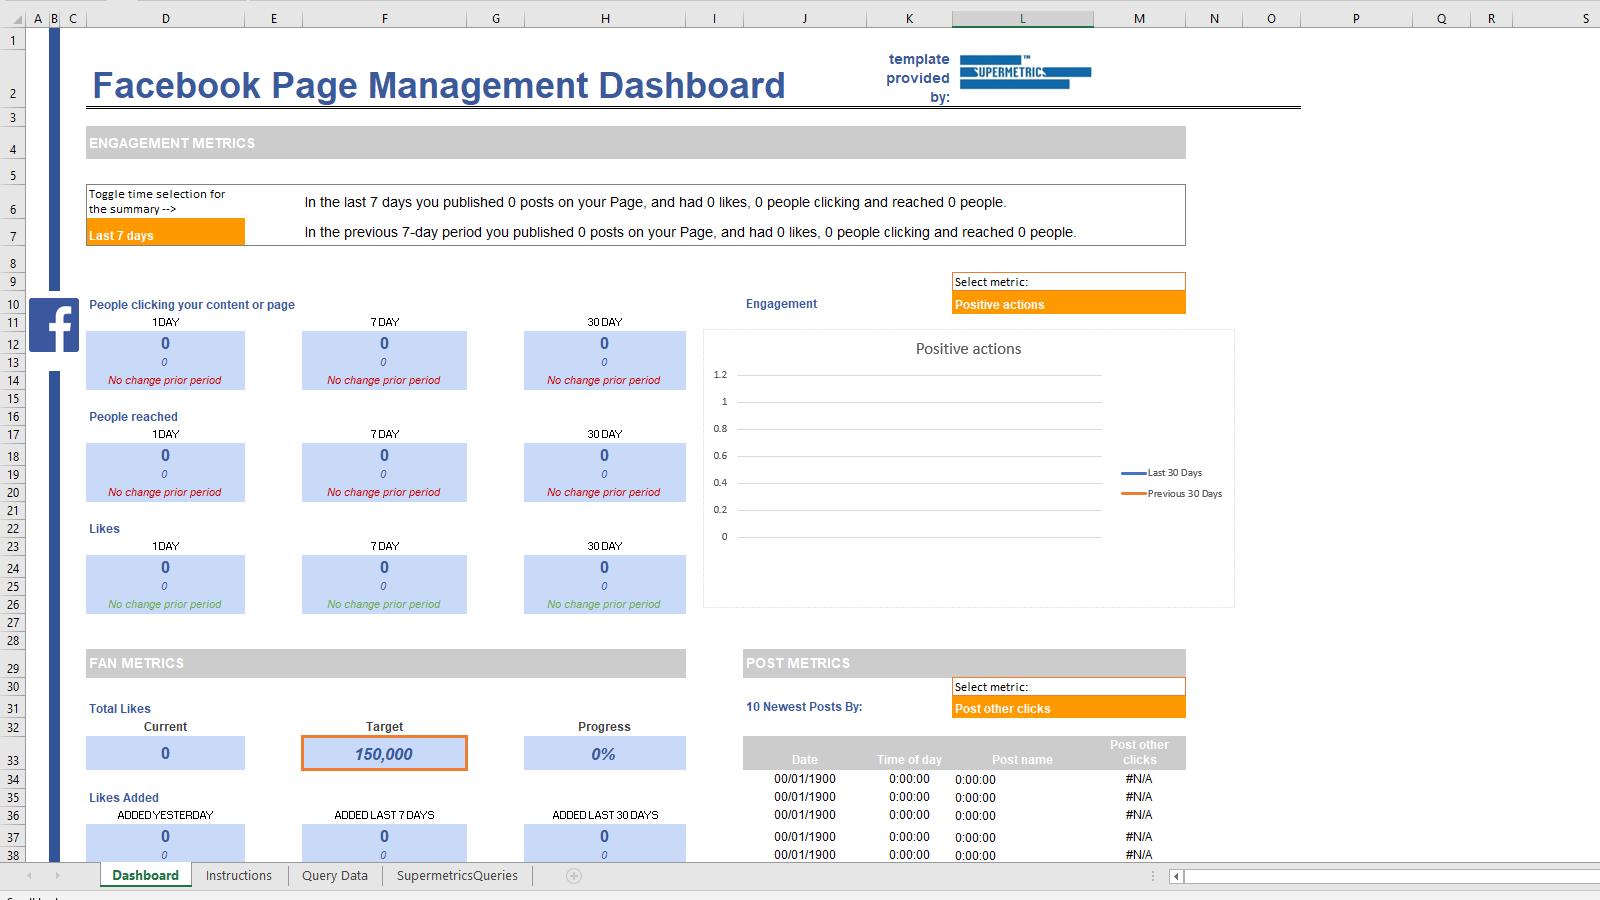 Facebook Page Management Dashboard